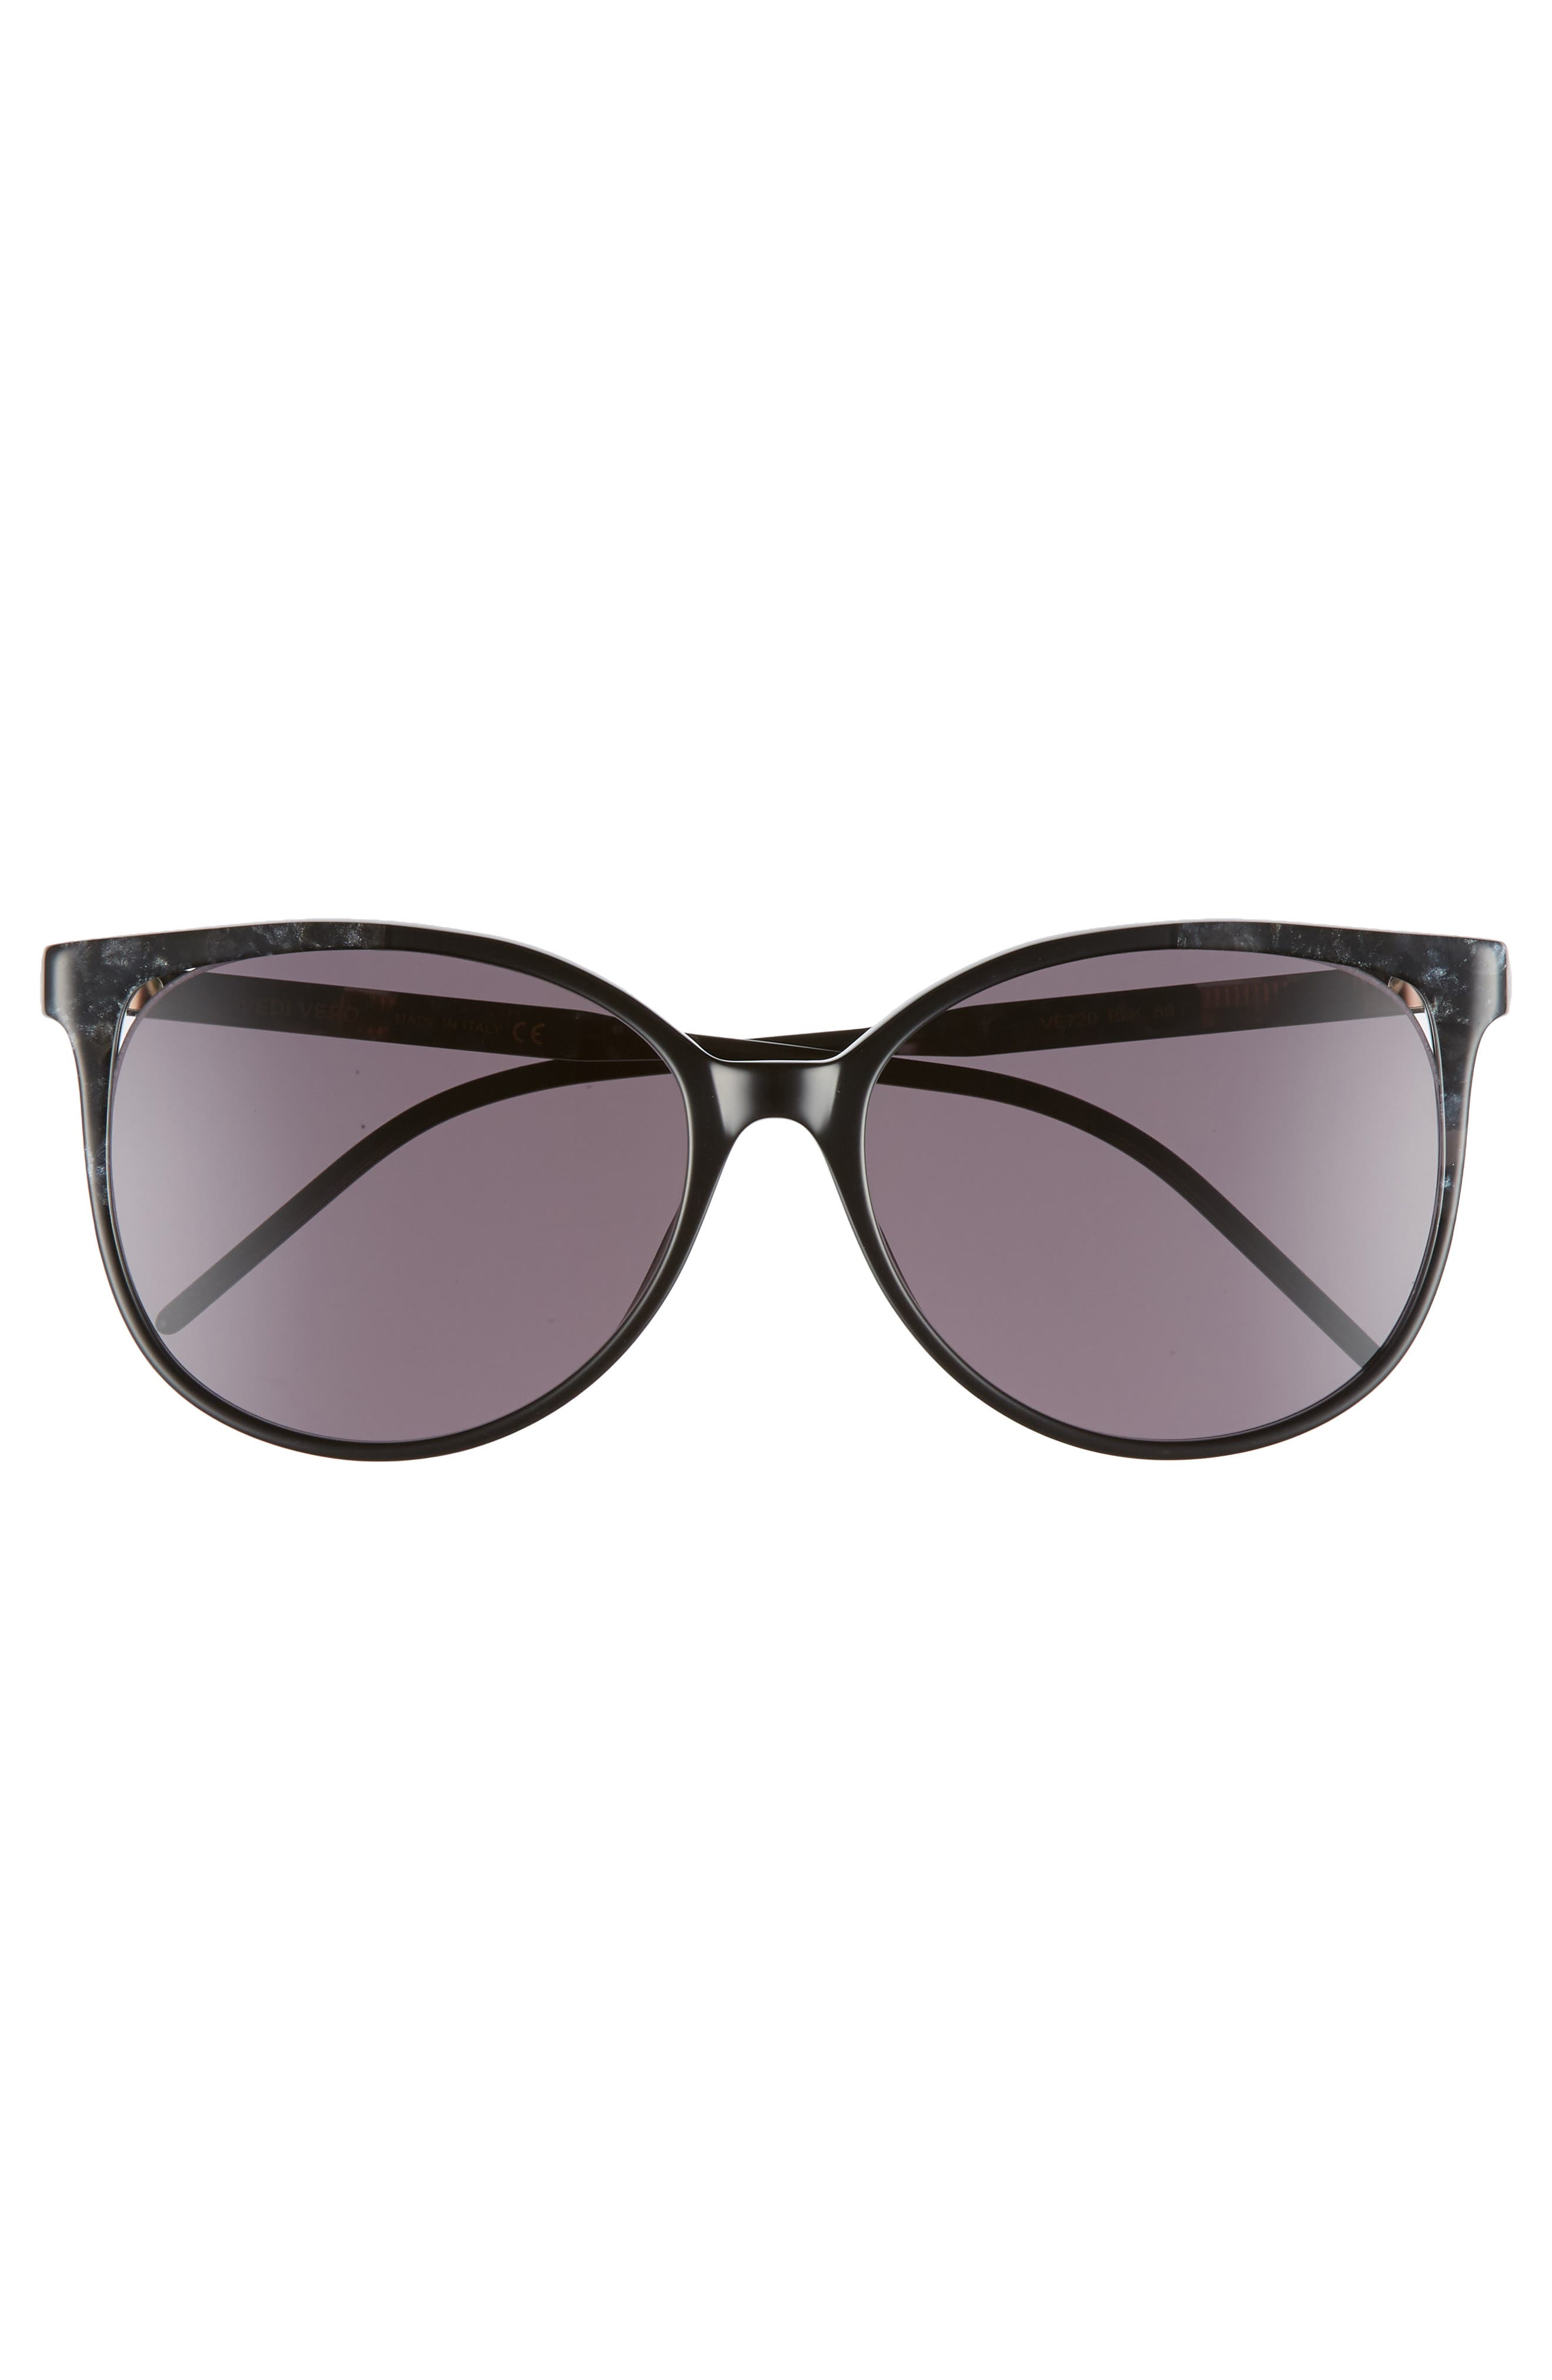 59mm Round Sunglasses,                             Alternate thumbnail 3, color,                             BLACK/BROWN